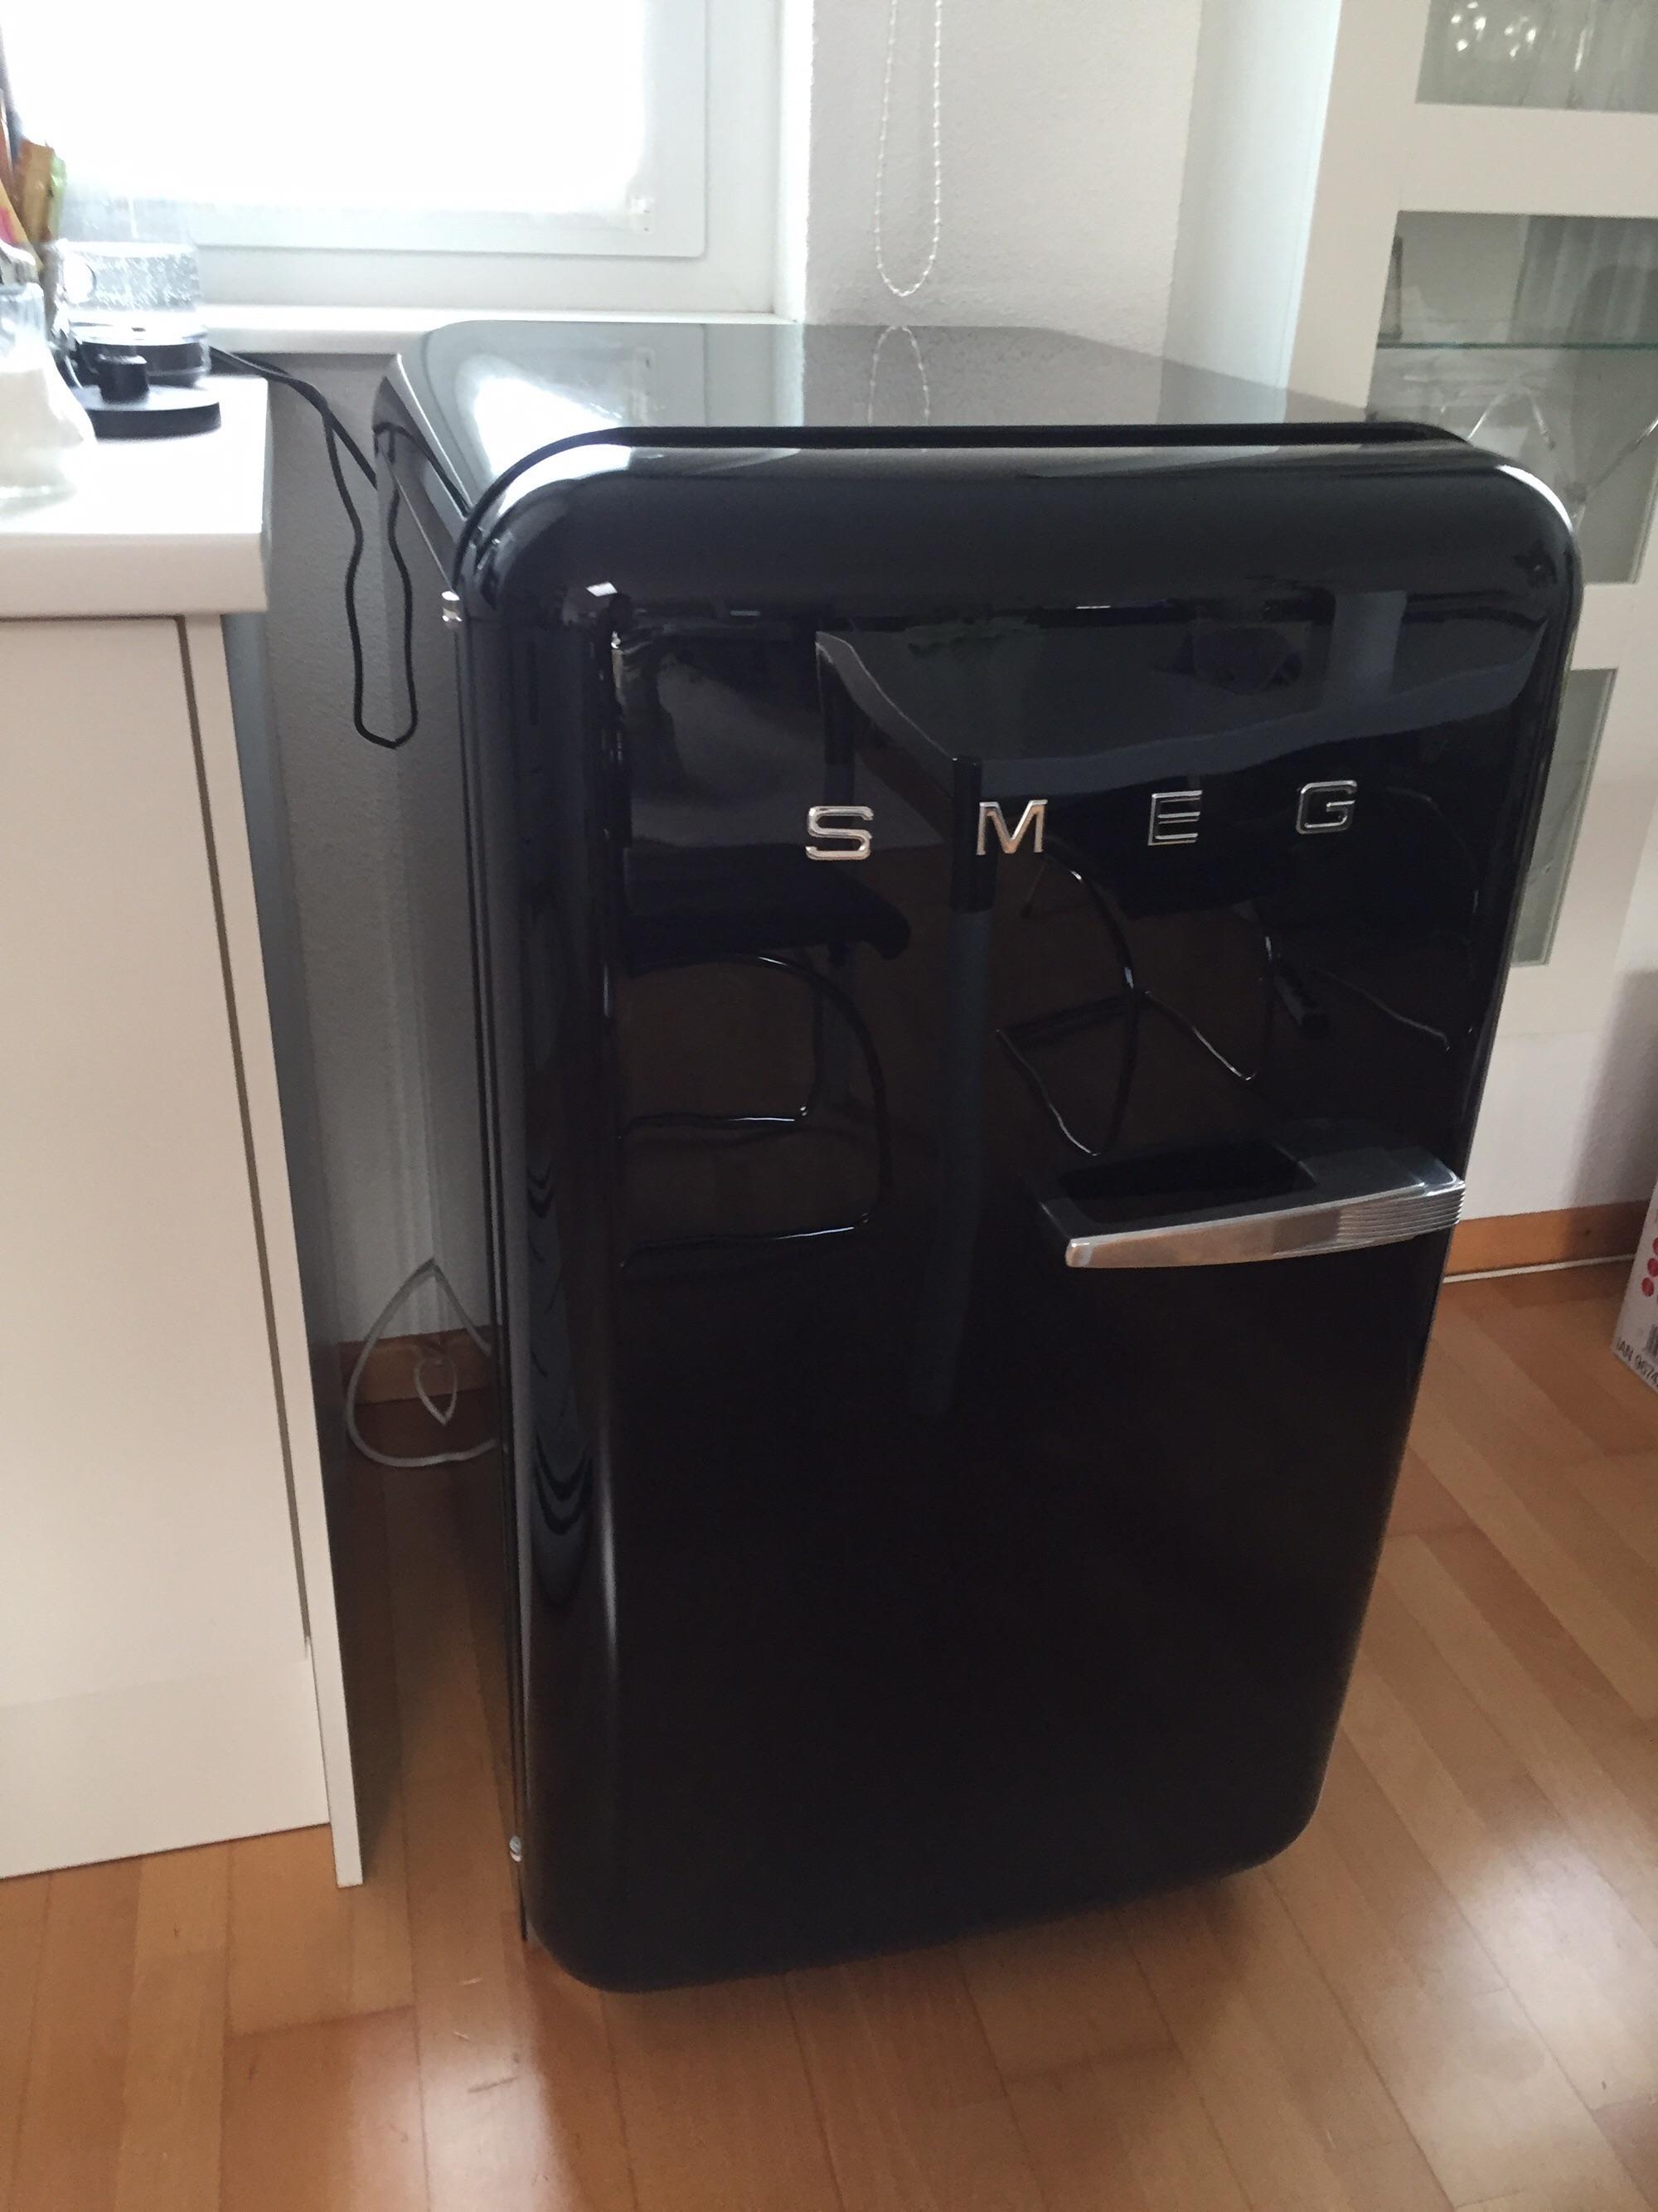 Smeg Kühlschrank Fab10 : Gebraucht smeg fab kühlschrank schwarz retro style in